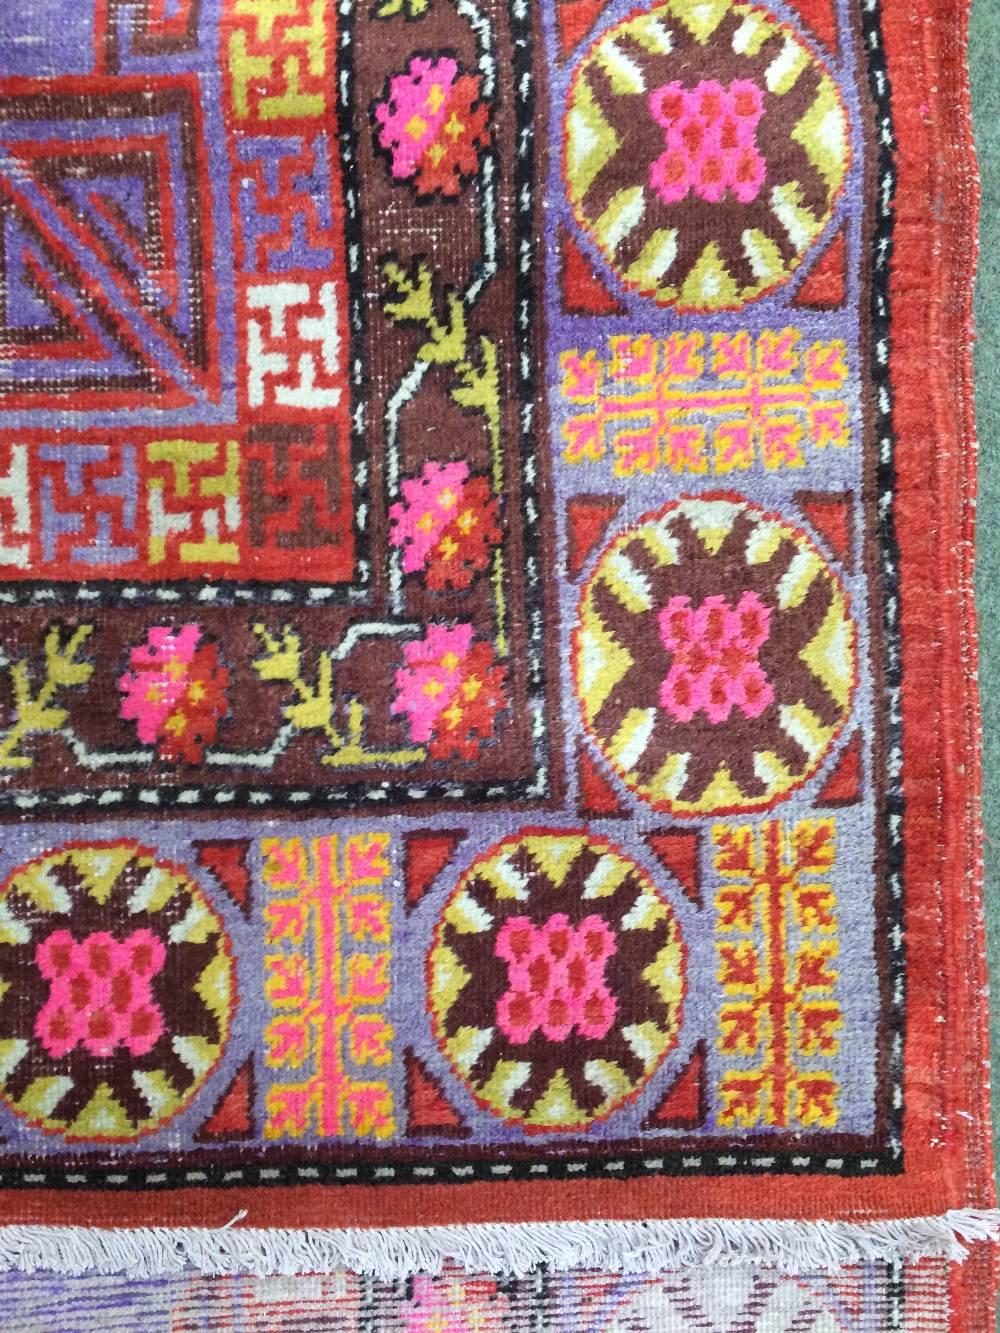 Lot 715 - Antique Samarkand carpet East Turkestan circa 1900 3.40 X 1.81m